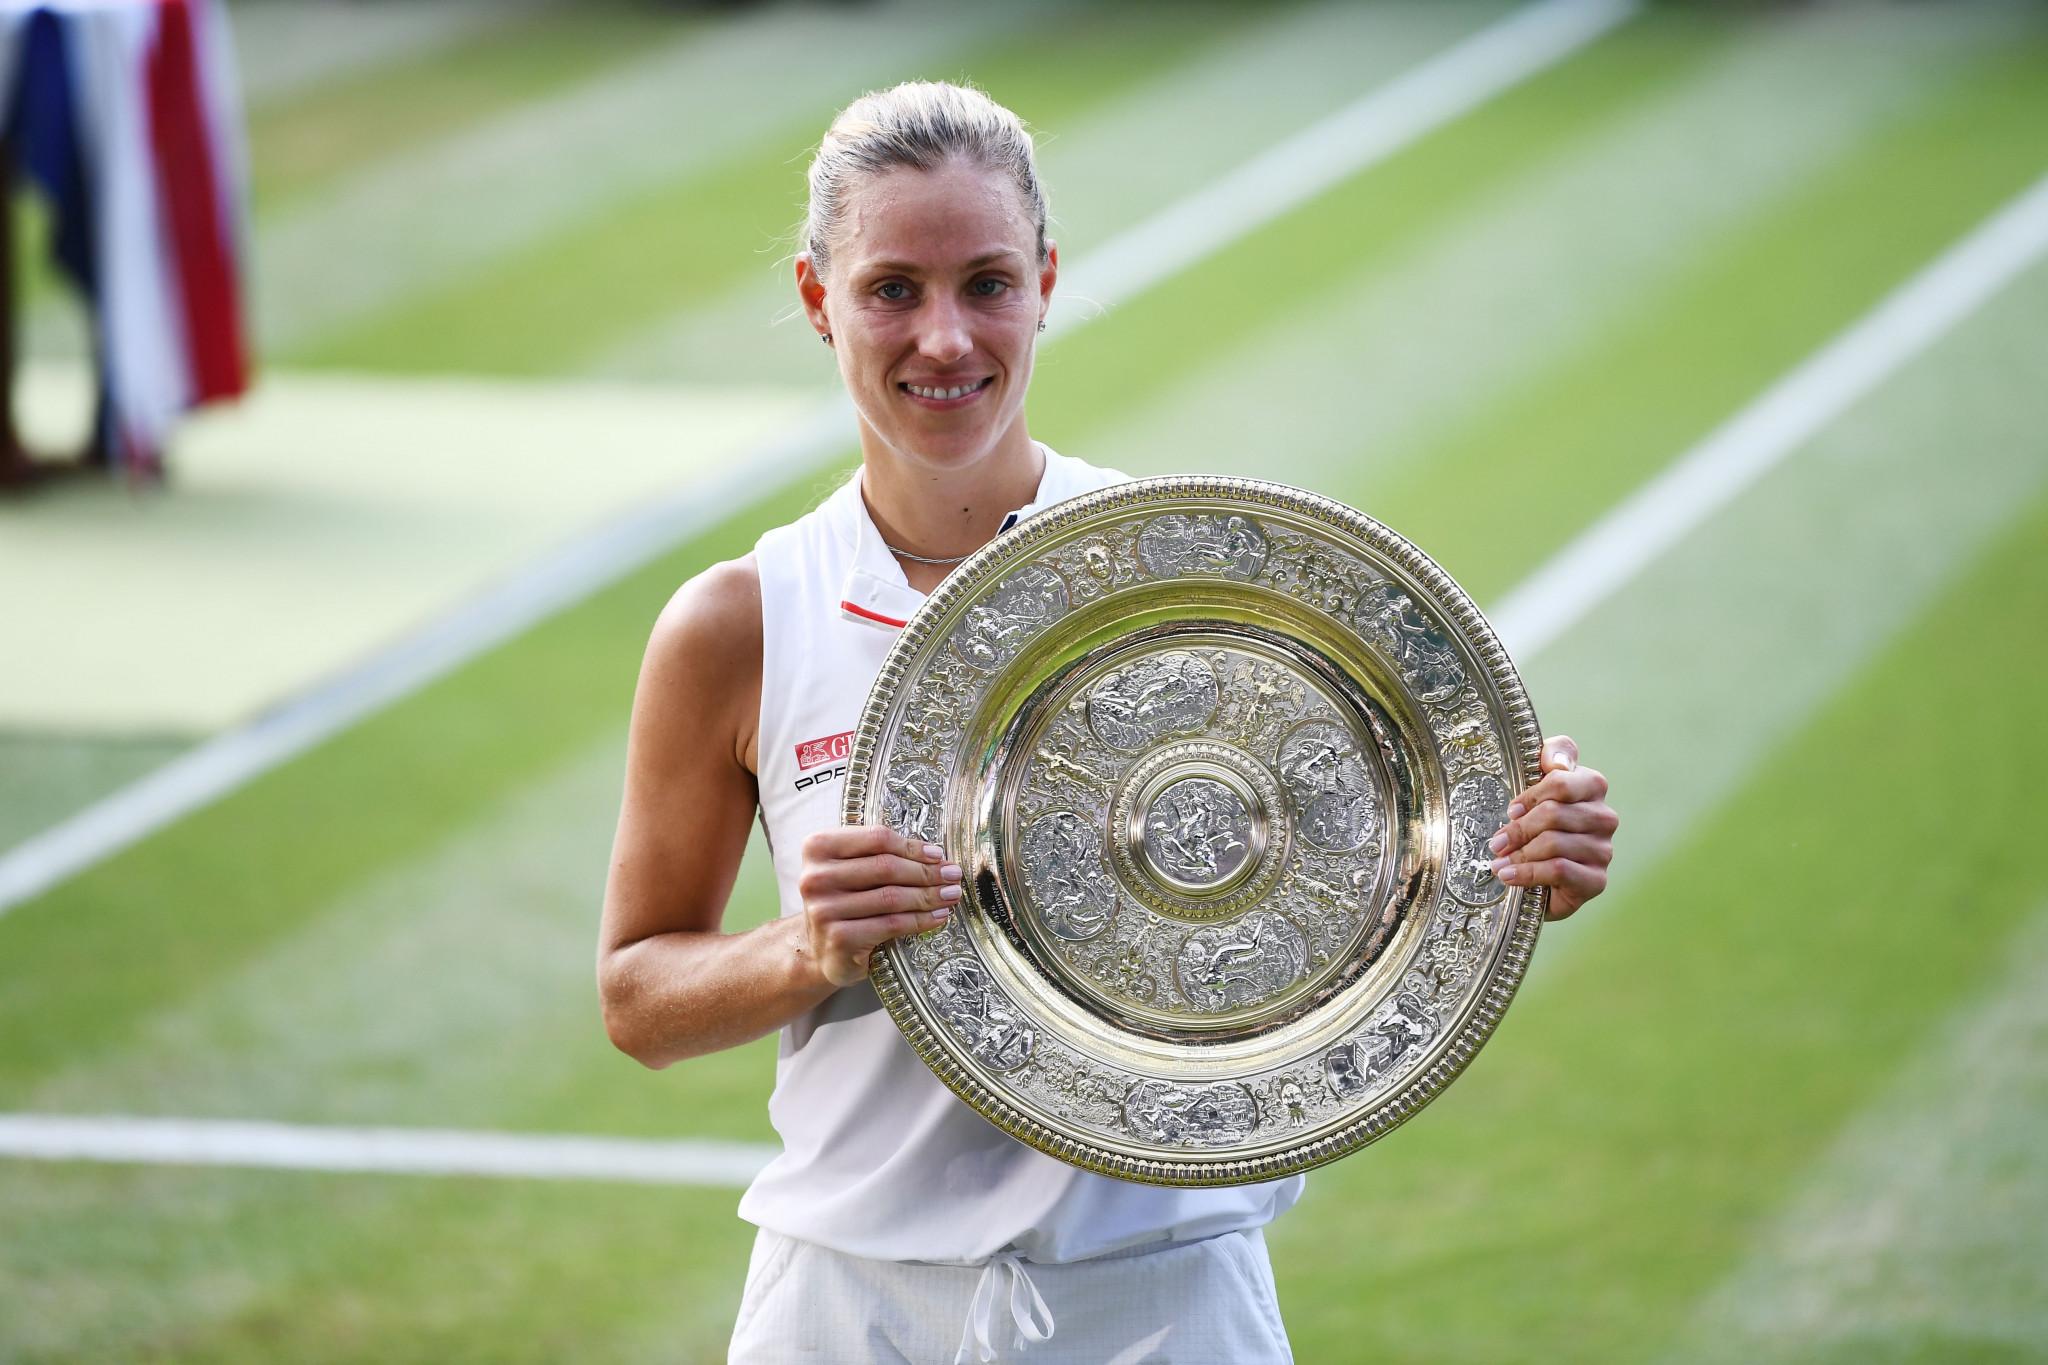 Kerber beats Williams to earn first Wimbledon title as Djokovic completes epic semi-final win over Nadal